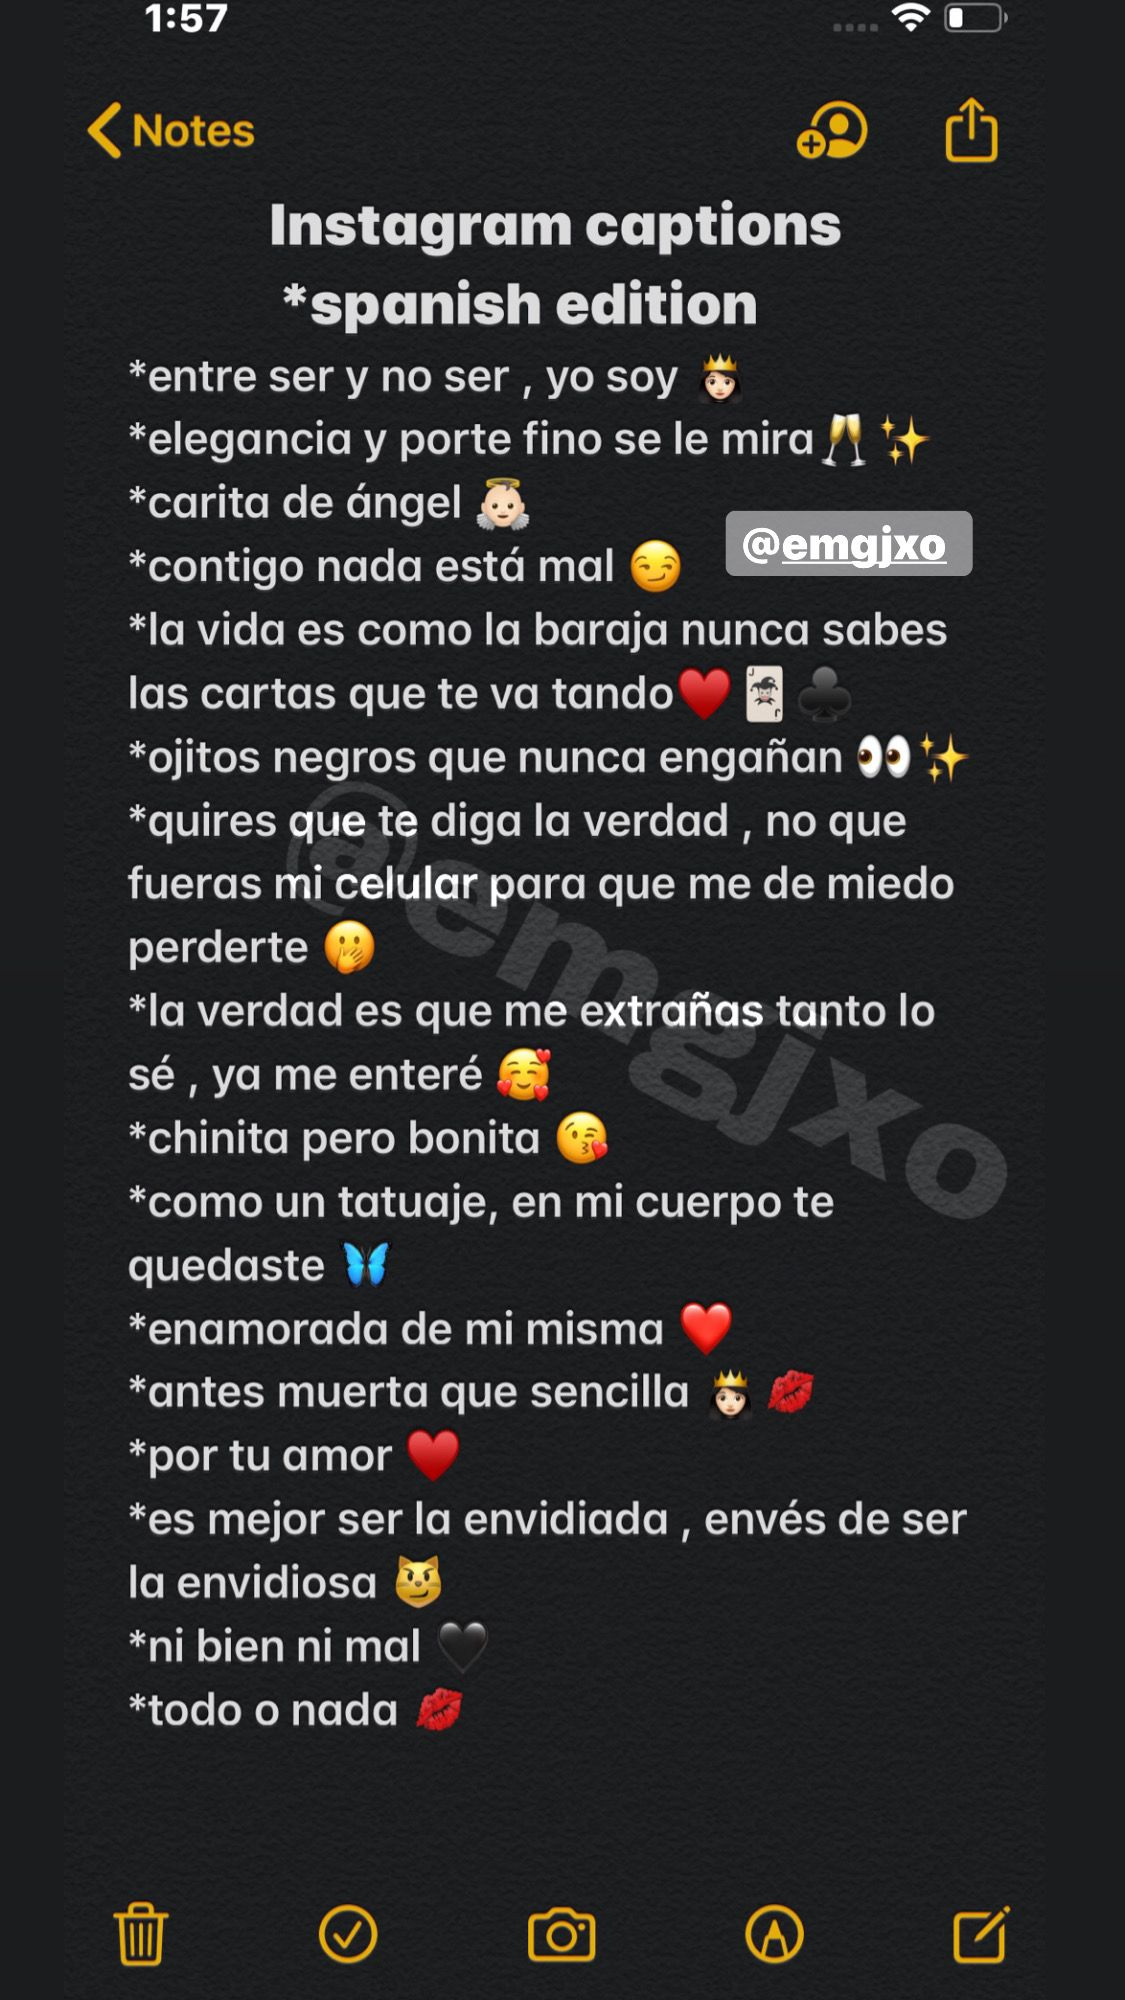 Baddie Captions In Spanish : baddie, captions, spanish, Instagram, Captions, *spanish, Edition, Short, Captions,, Witty